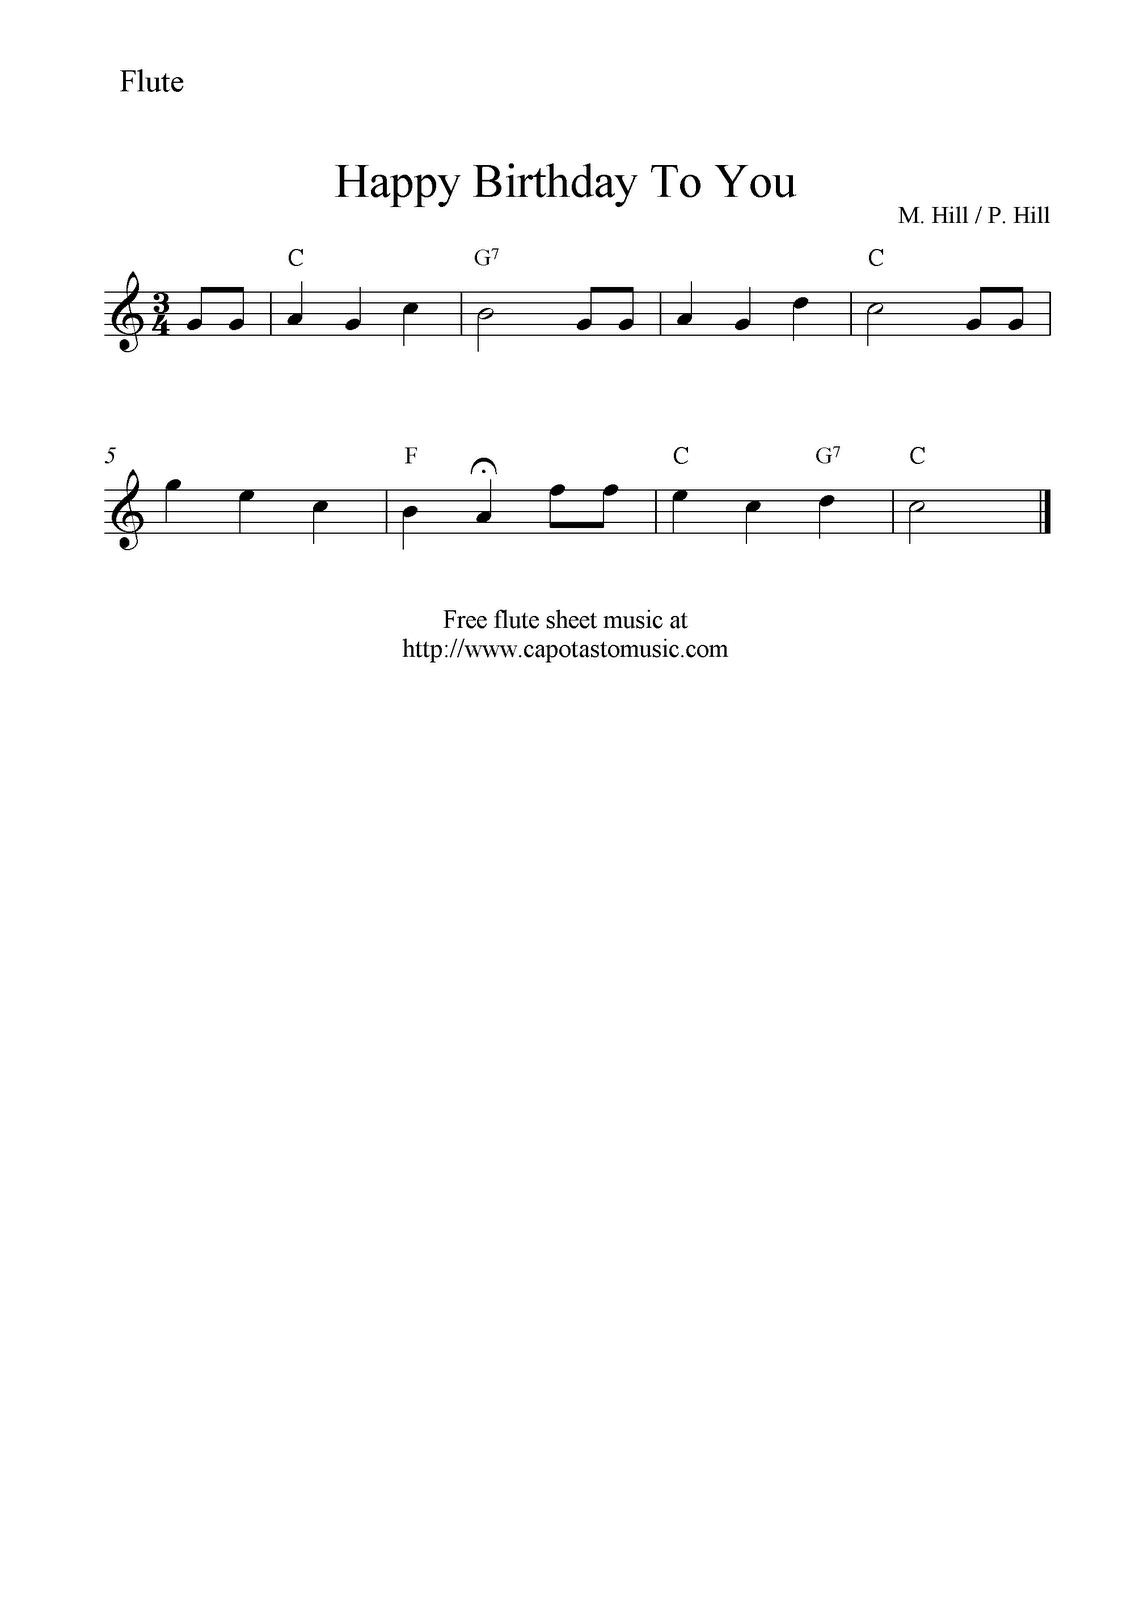 Free Sheet Music Scores: Happy Birthday To You, Free Flute Sheet - Free Printable Flute Music